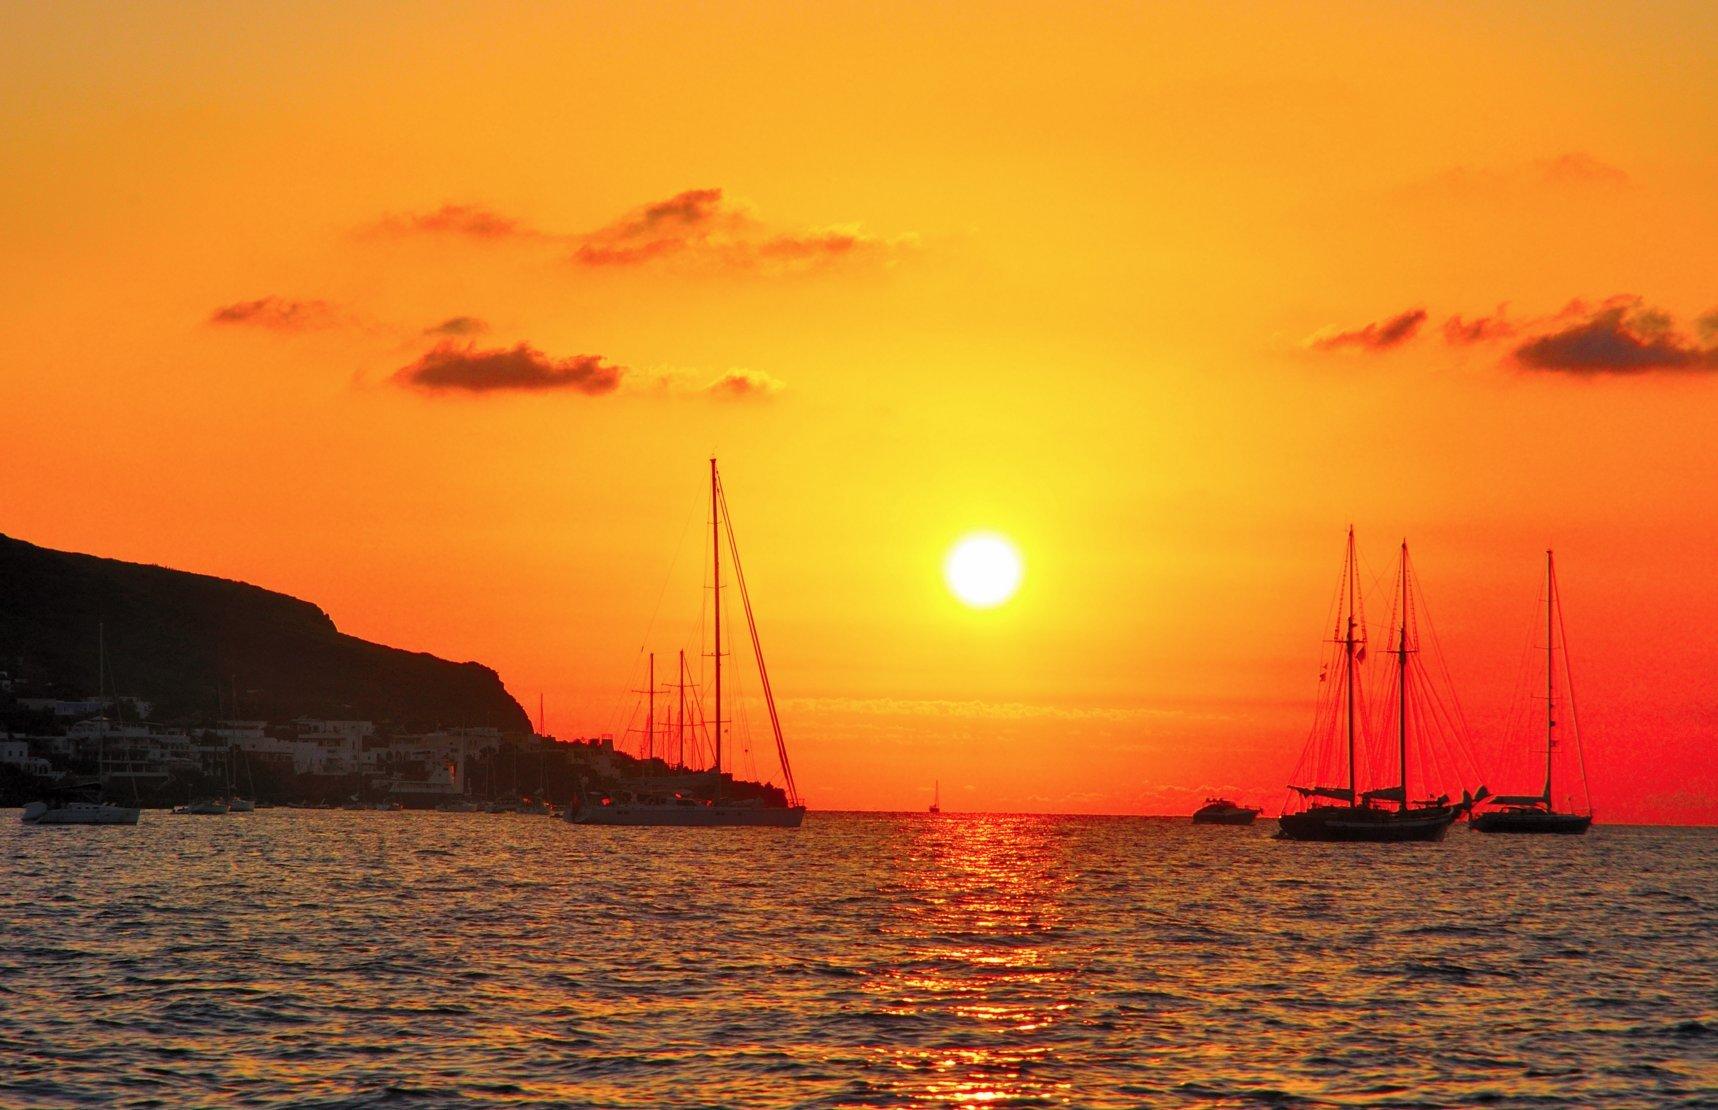 stromboli-yacht-charter-stromboli-yacht-rental-stromboli-boat-charter-stromboli-boat-rental-stromboli-sailing-charter-rental-charter-aeolian-islands